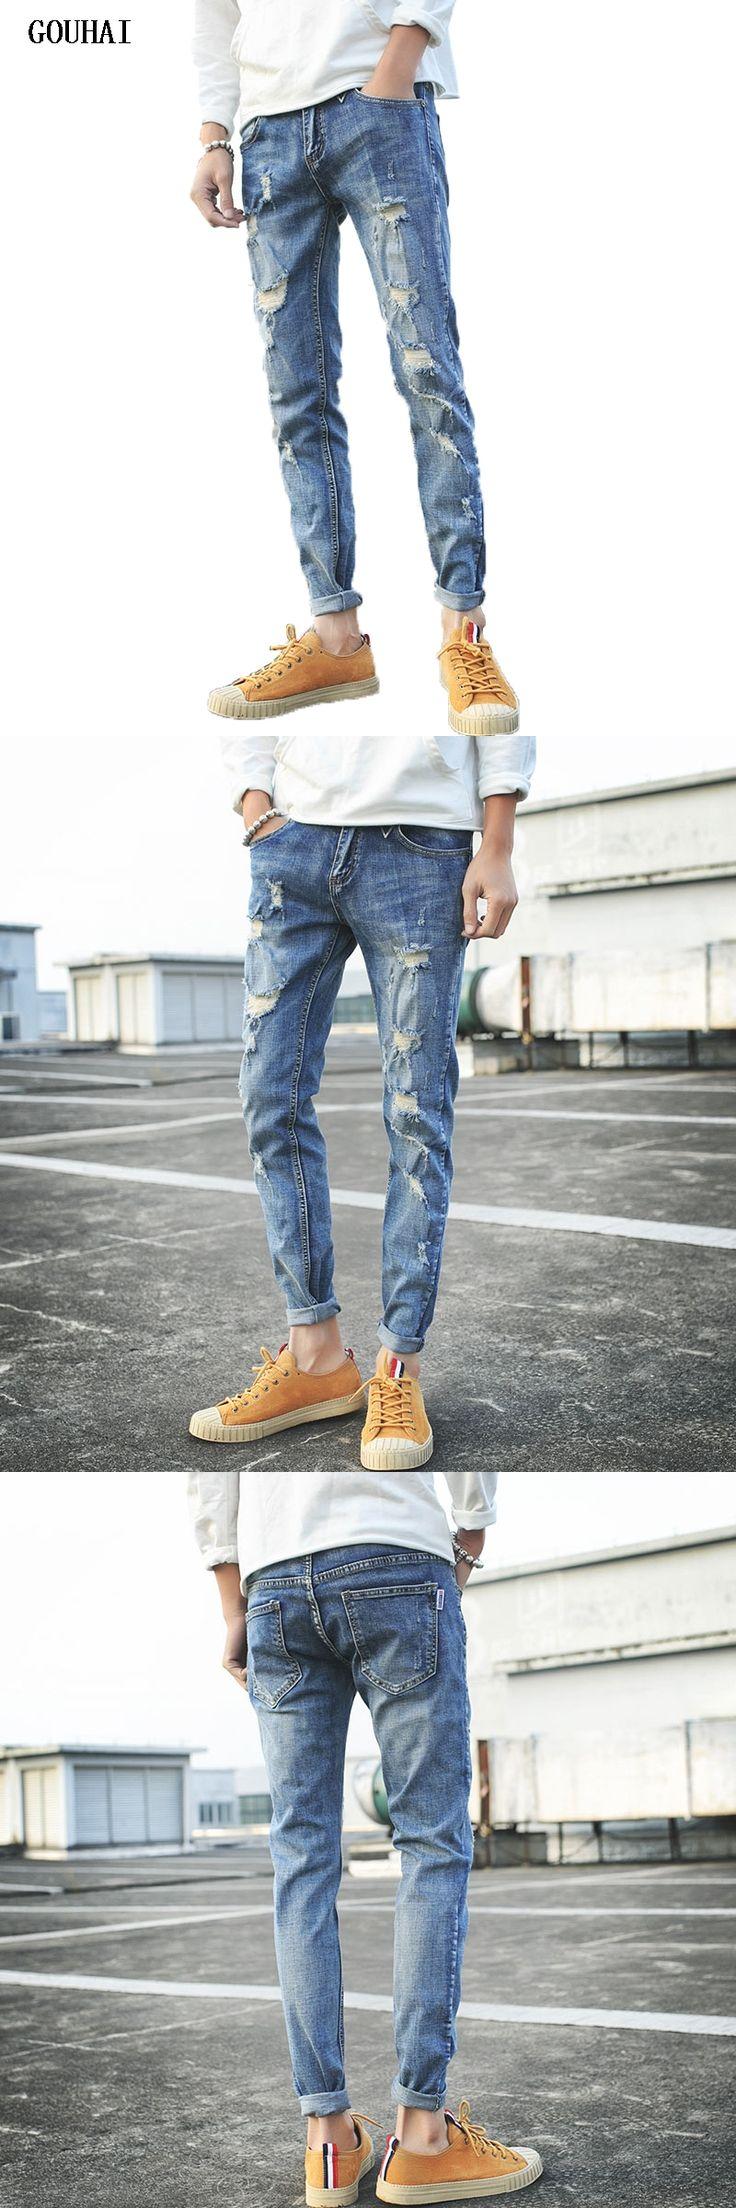 GOUHAI 2017 New Spring Hole Jeans Men Long Trousers Skinny Jeans Pants Hip Hop Clothing Zipper Jeans  Men Slim Fit Rip Jeans